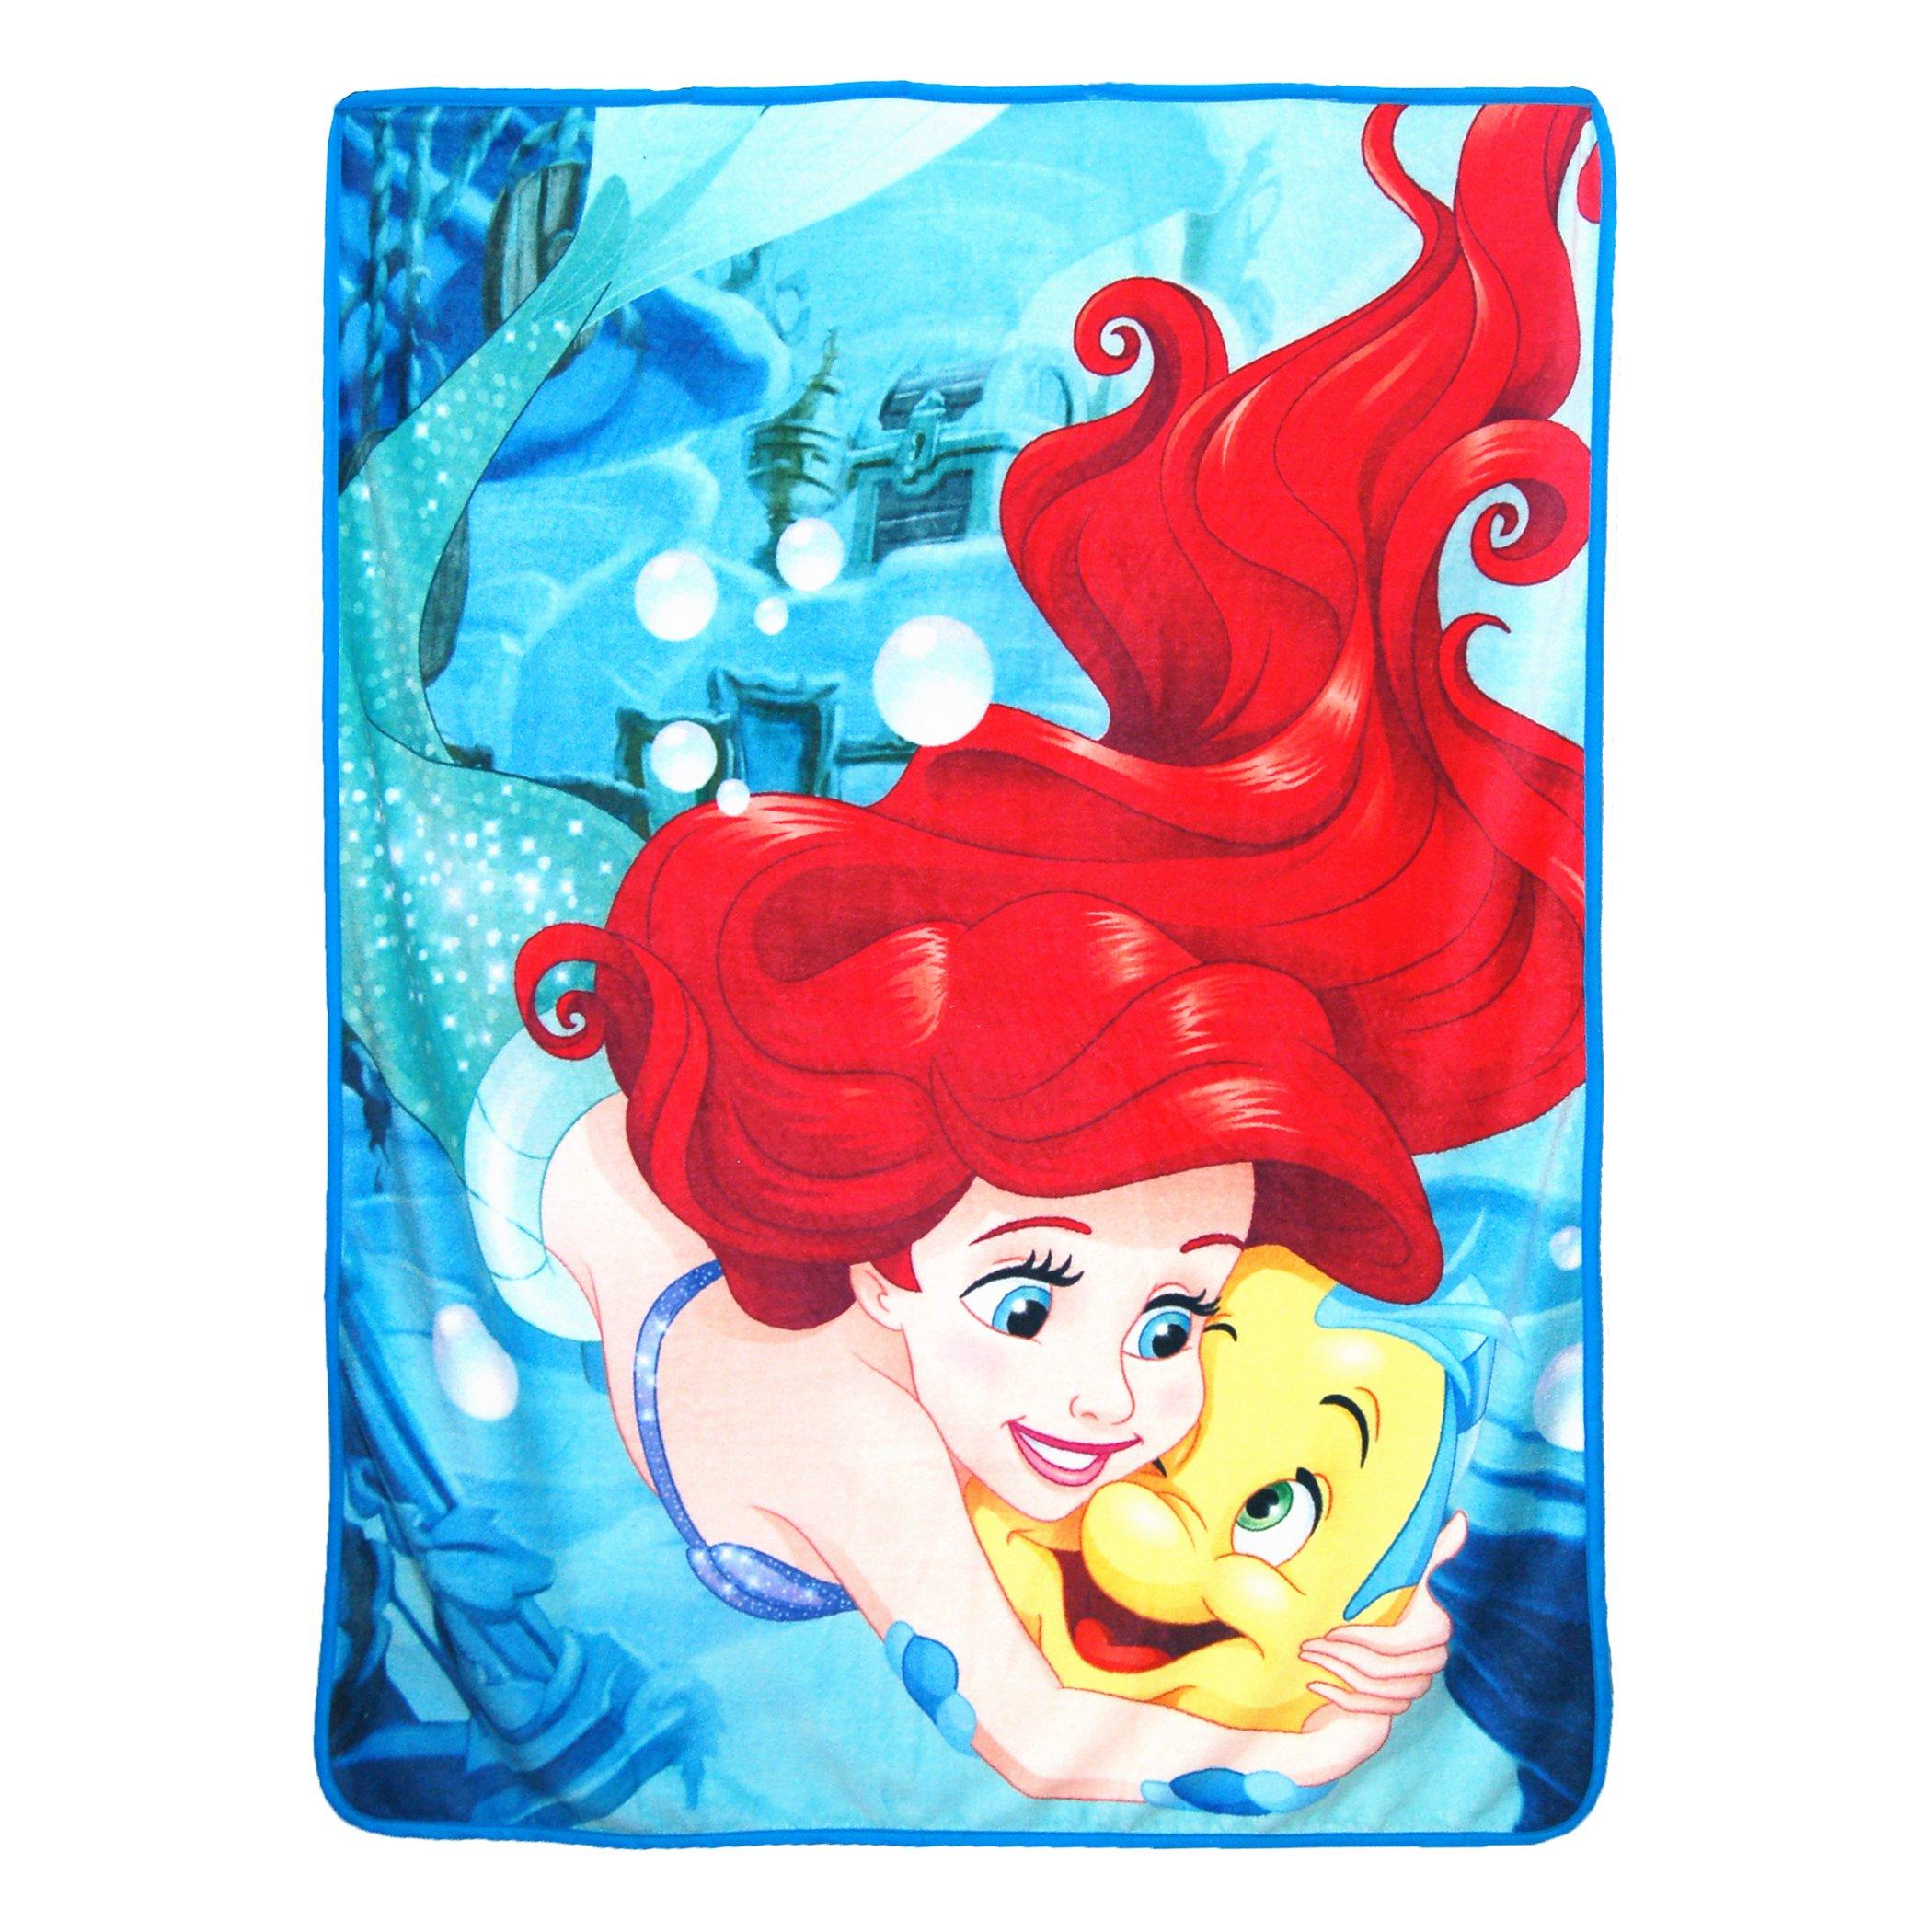 Disney's The Little Mermaid, ''Flounder Friend'' Micro Raschel Throw Blanket, 46'' x 60'', Multi Color